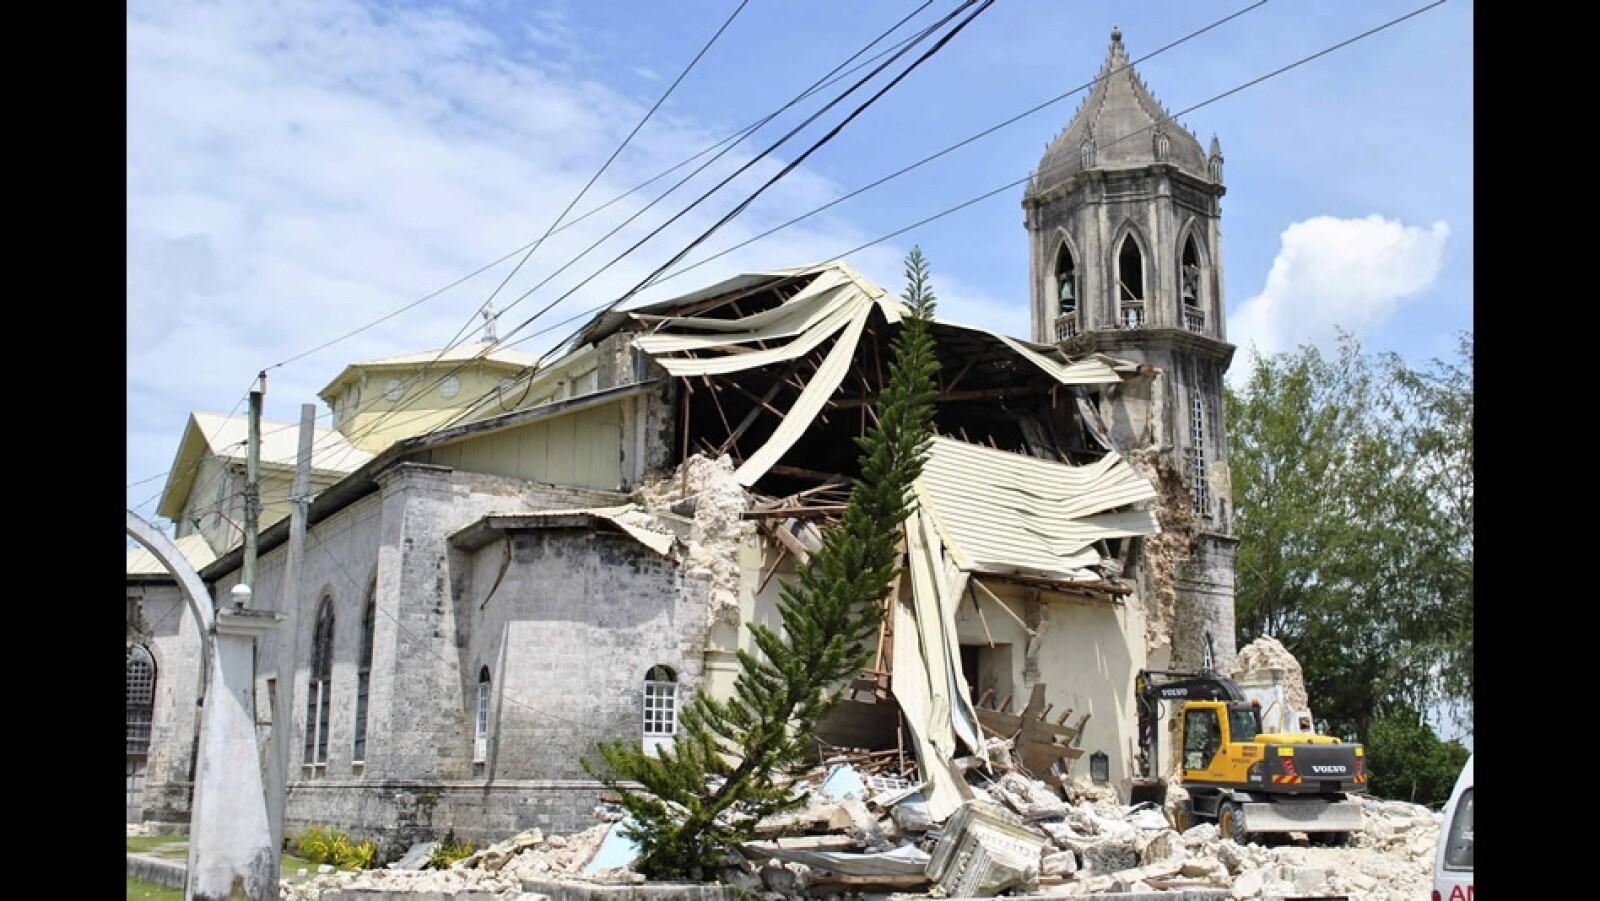 iglesia derrumbada por el terremoto